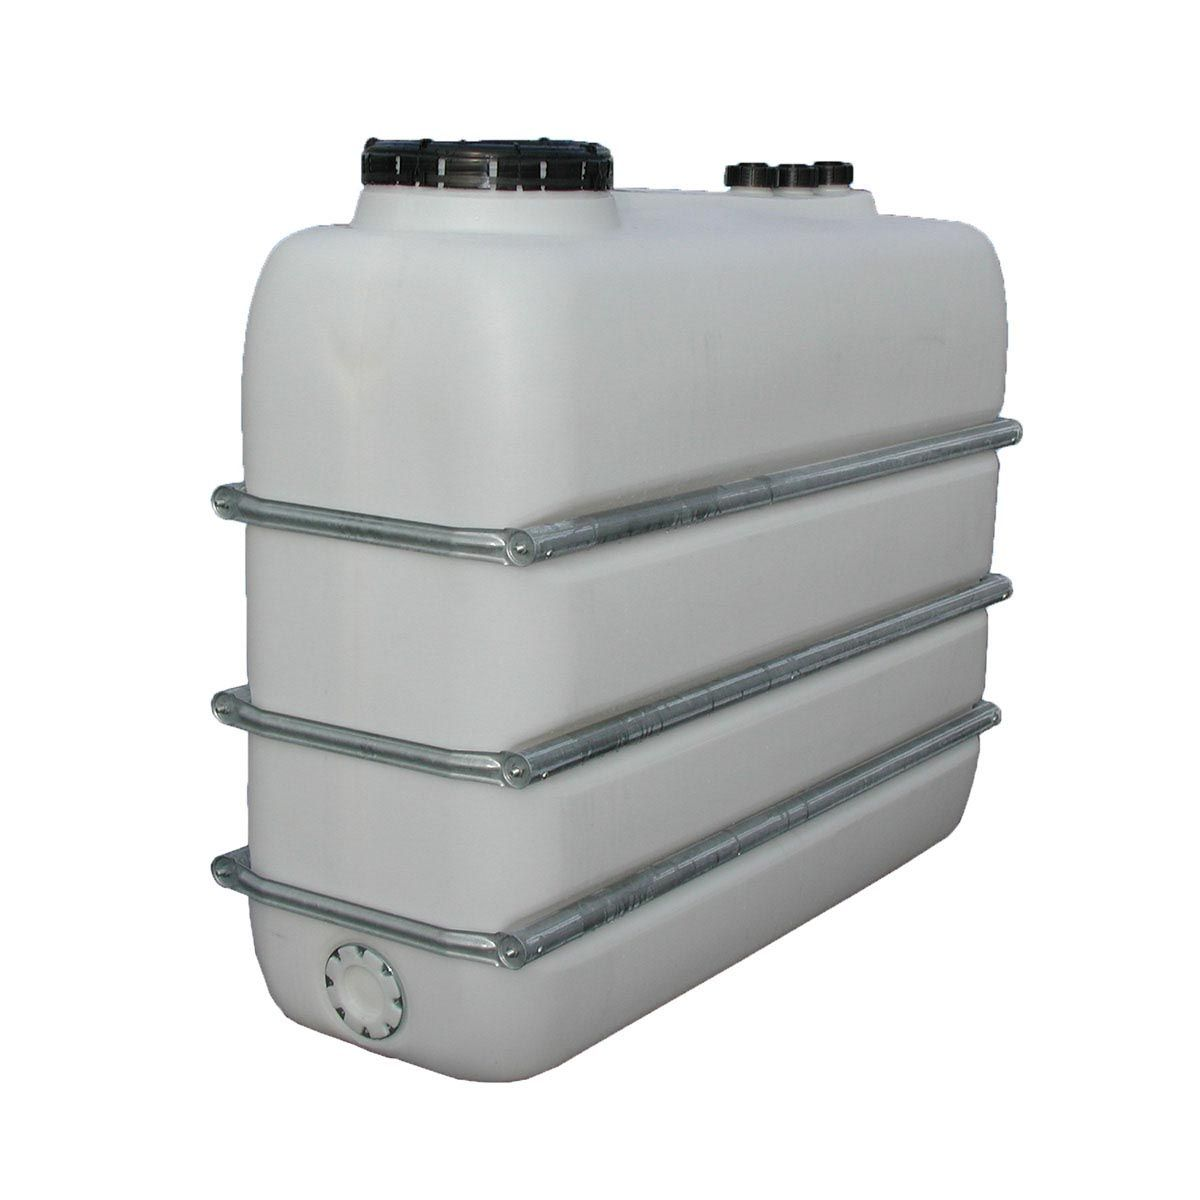 Lagertank PEDF, aus PE-HD, natur, 1100 l, 1400 x 720 x 1400 mm